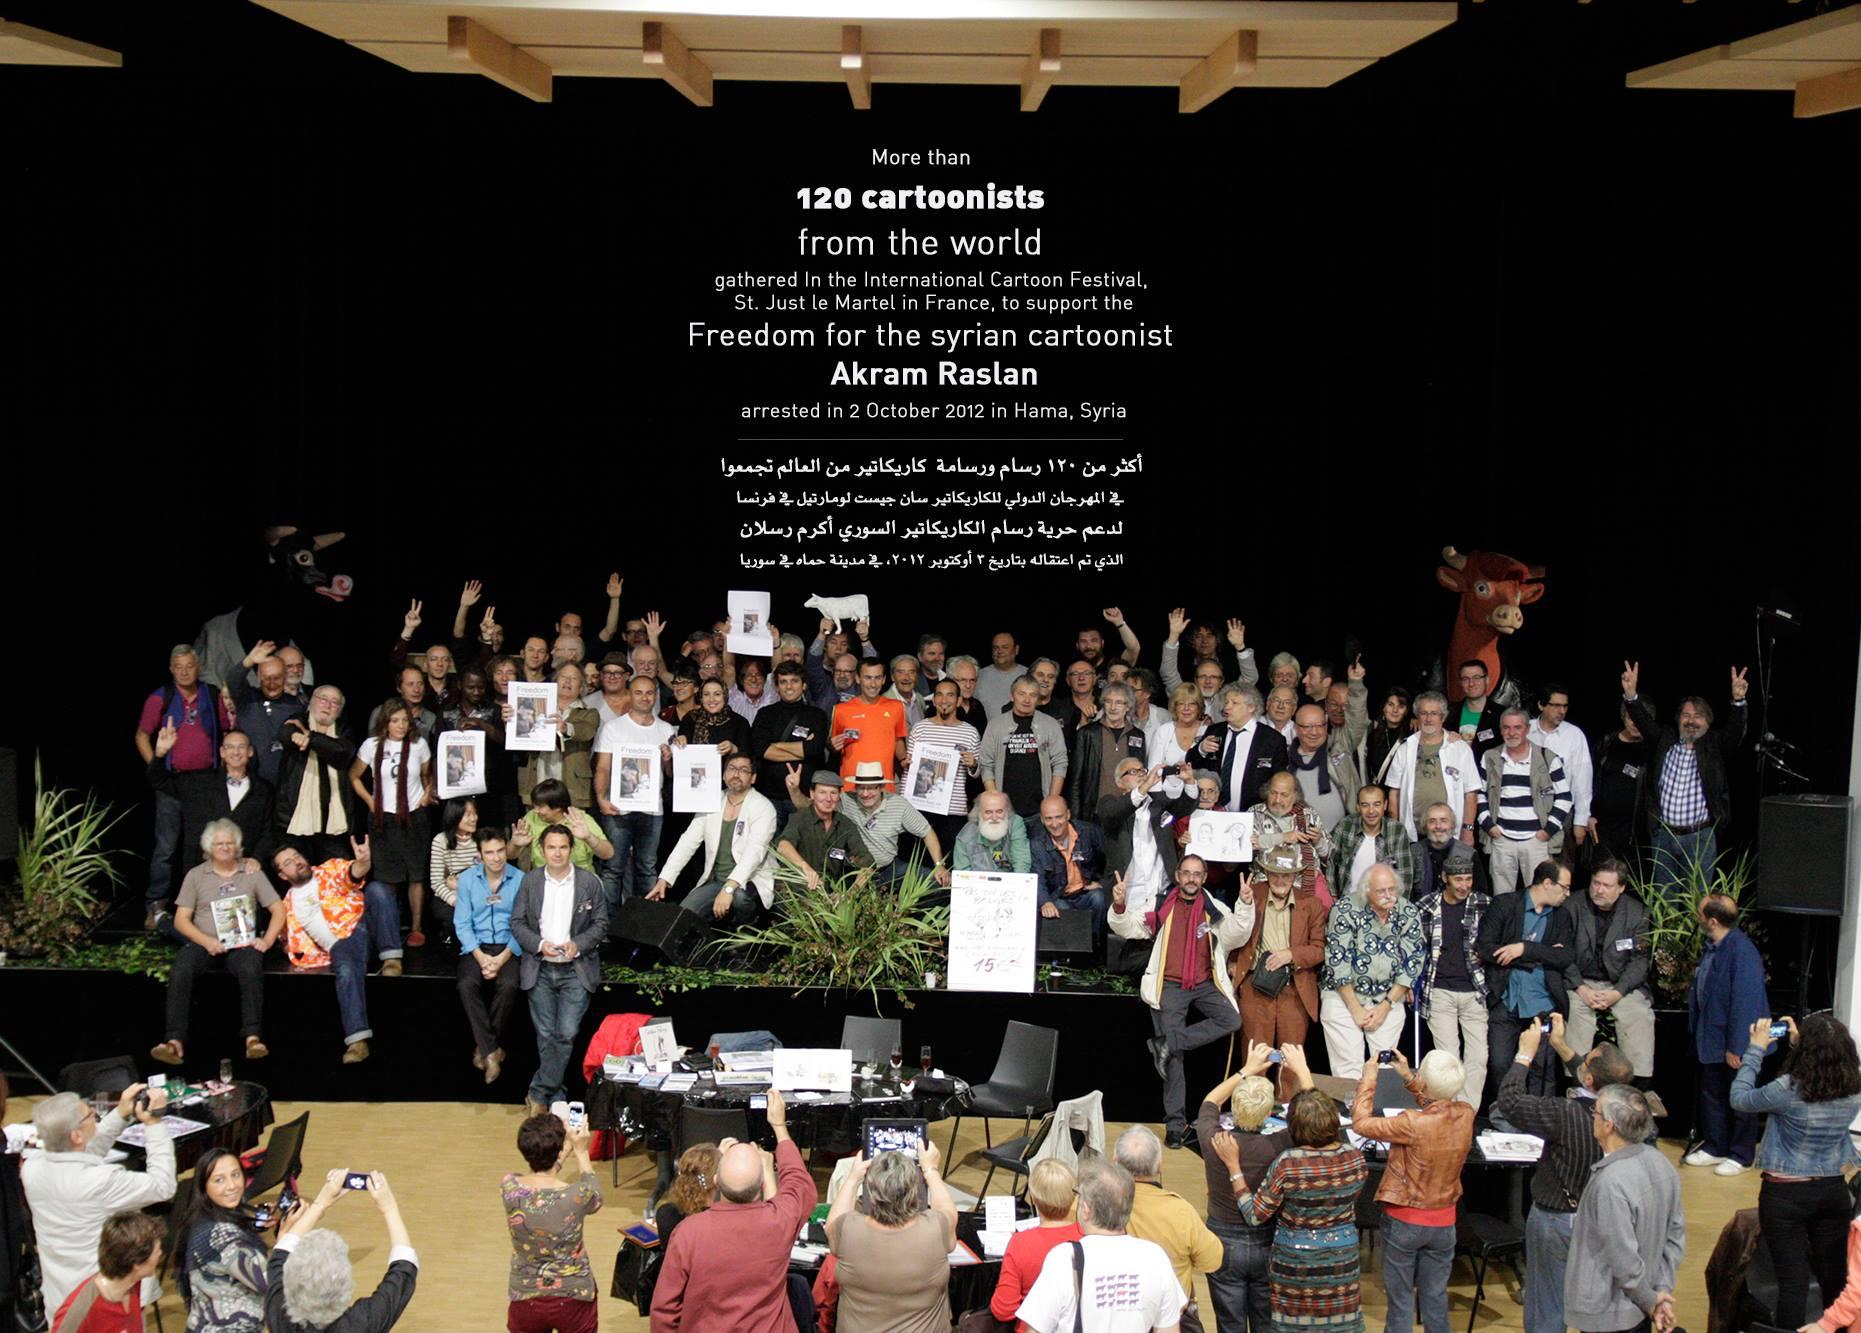 Freedom for Akram Raslan